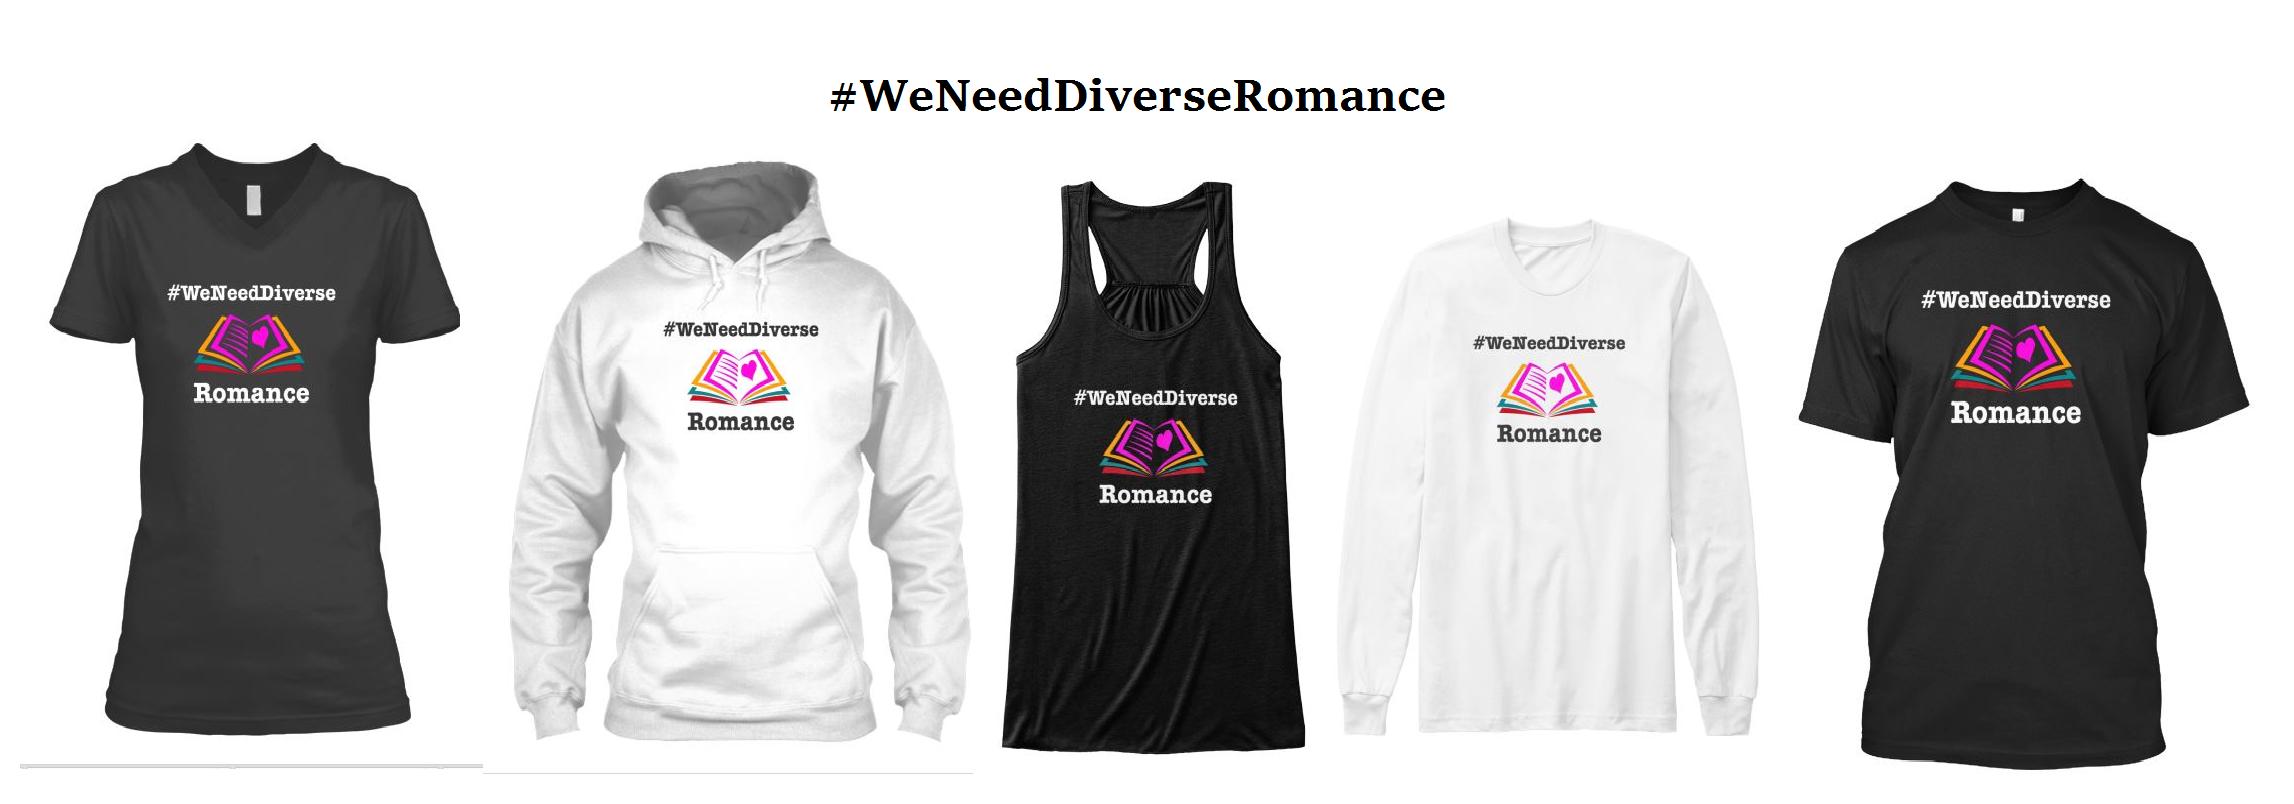 Diverse romance gear tee